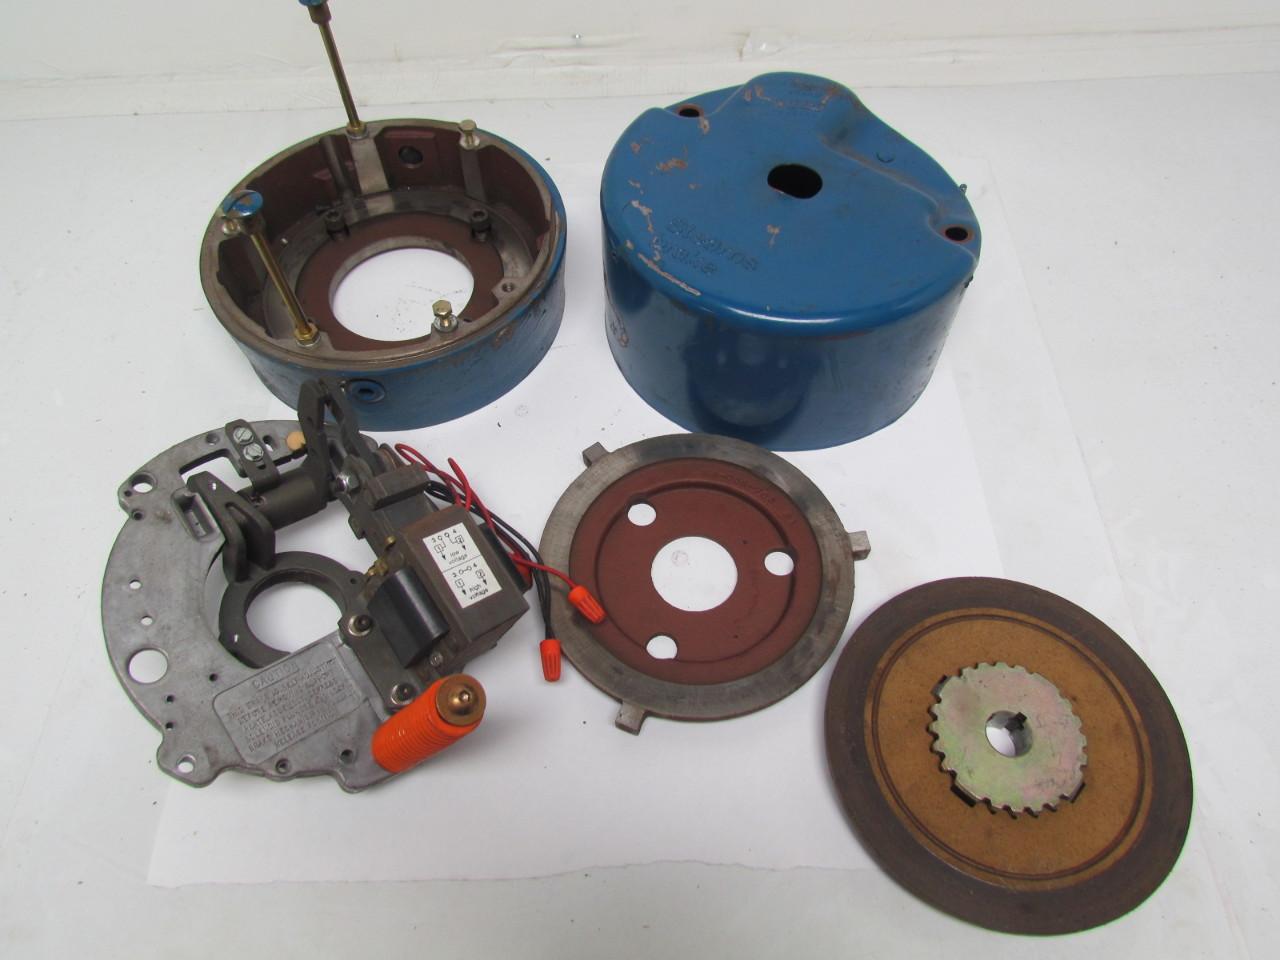 stearns brake wiring diagram 2002 honda civic ac rexnord 1087031z5dpf motor torque 25lb ft